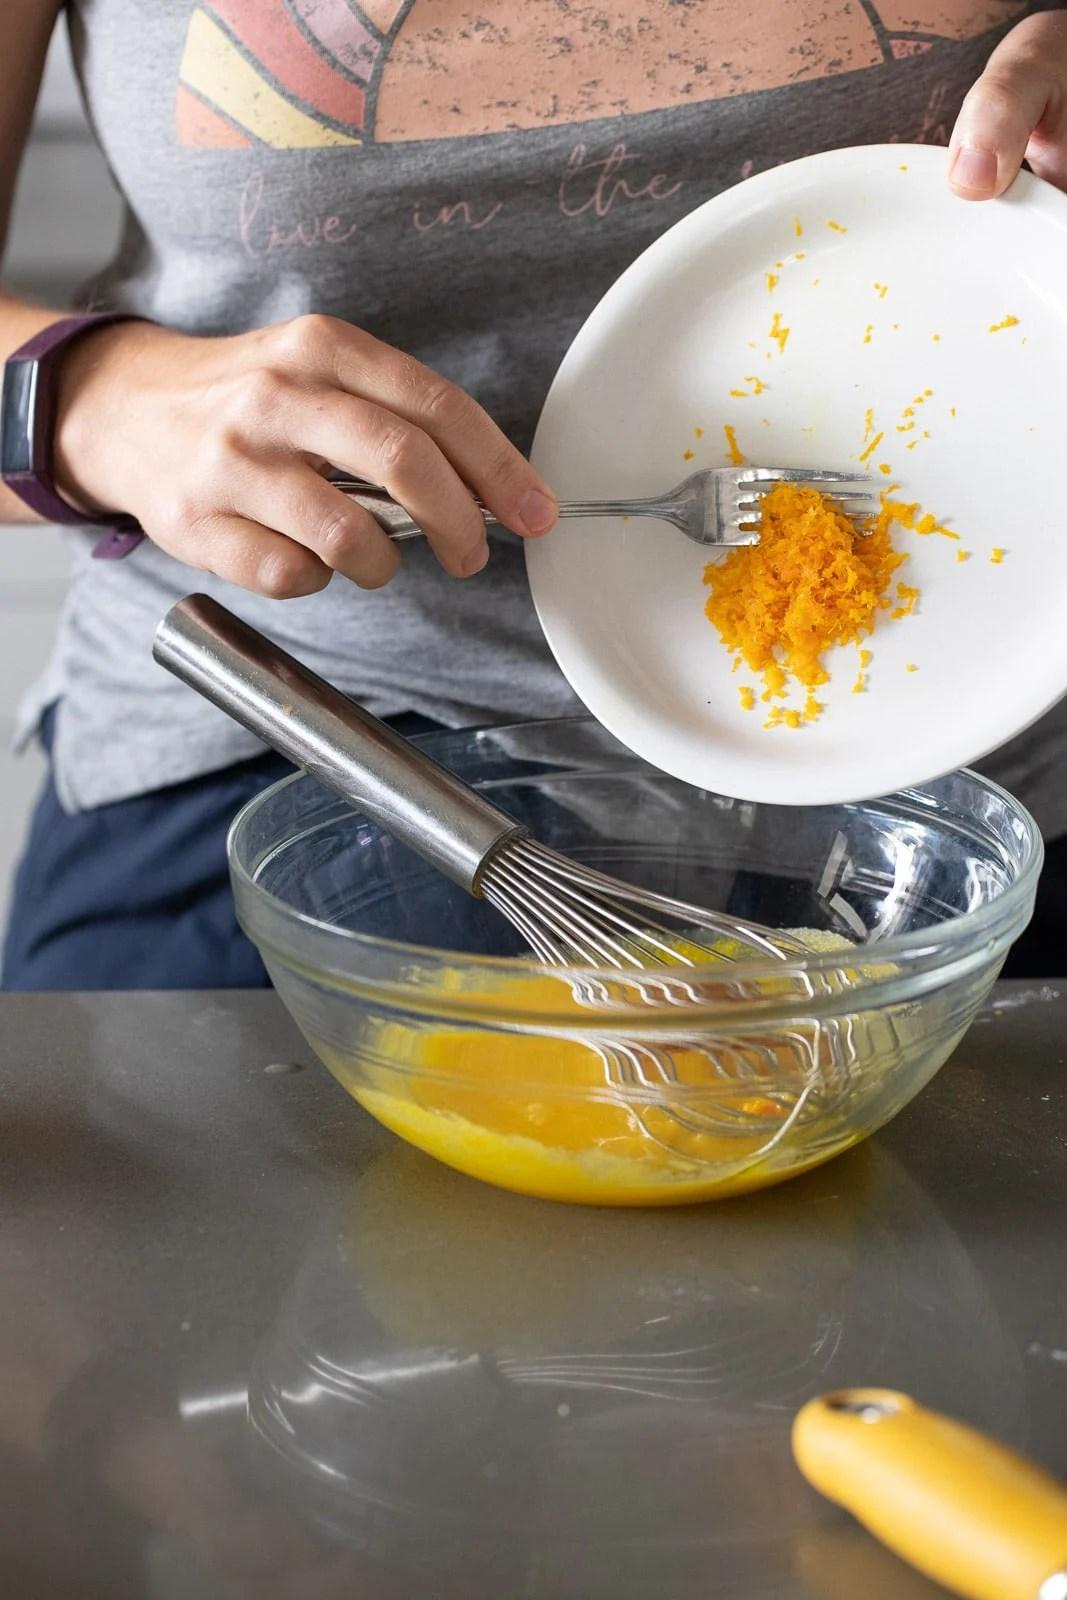 woman adding orange zest to egg yolks.